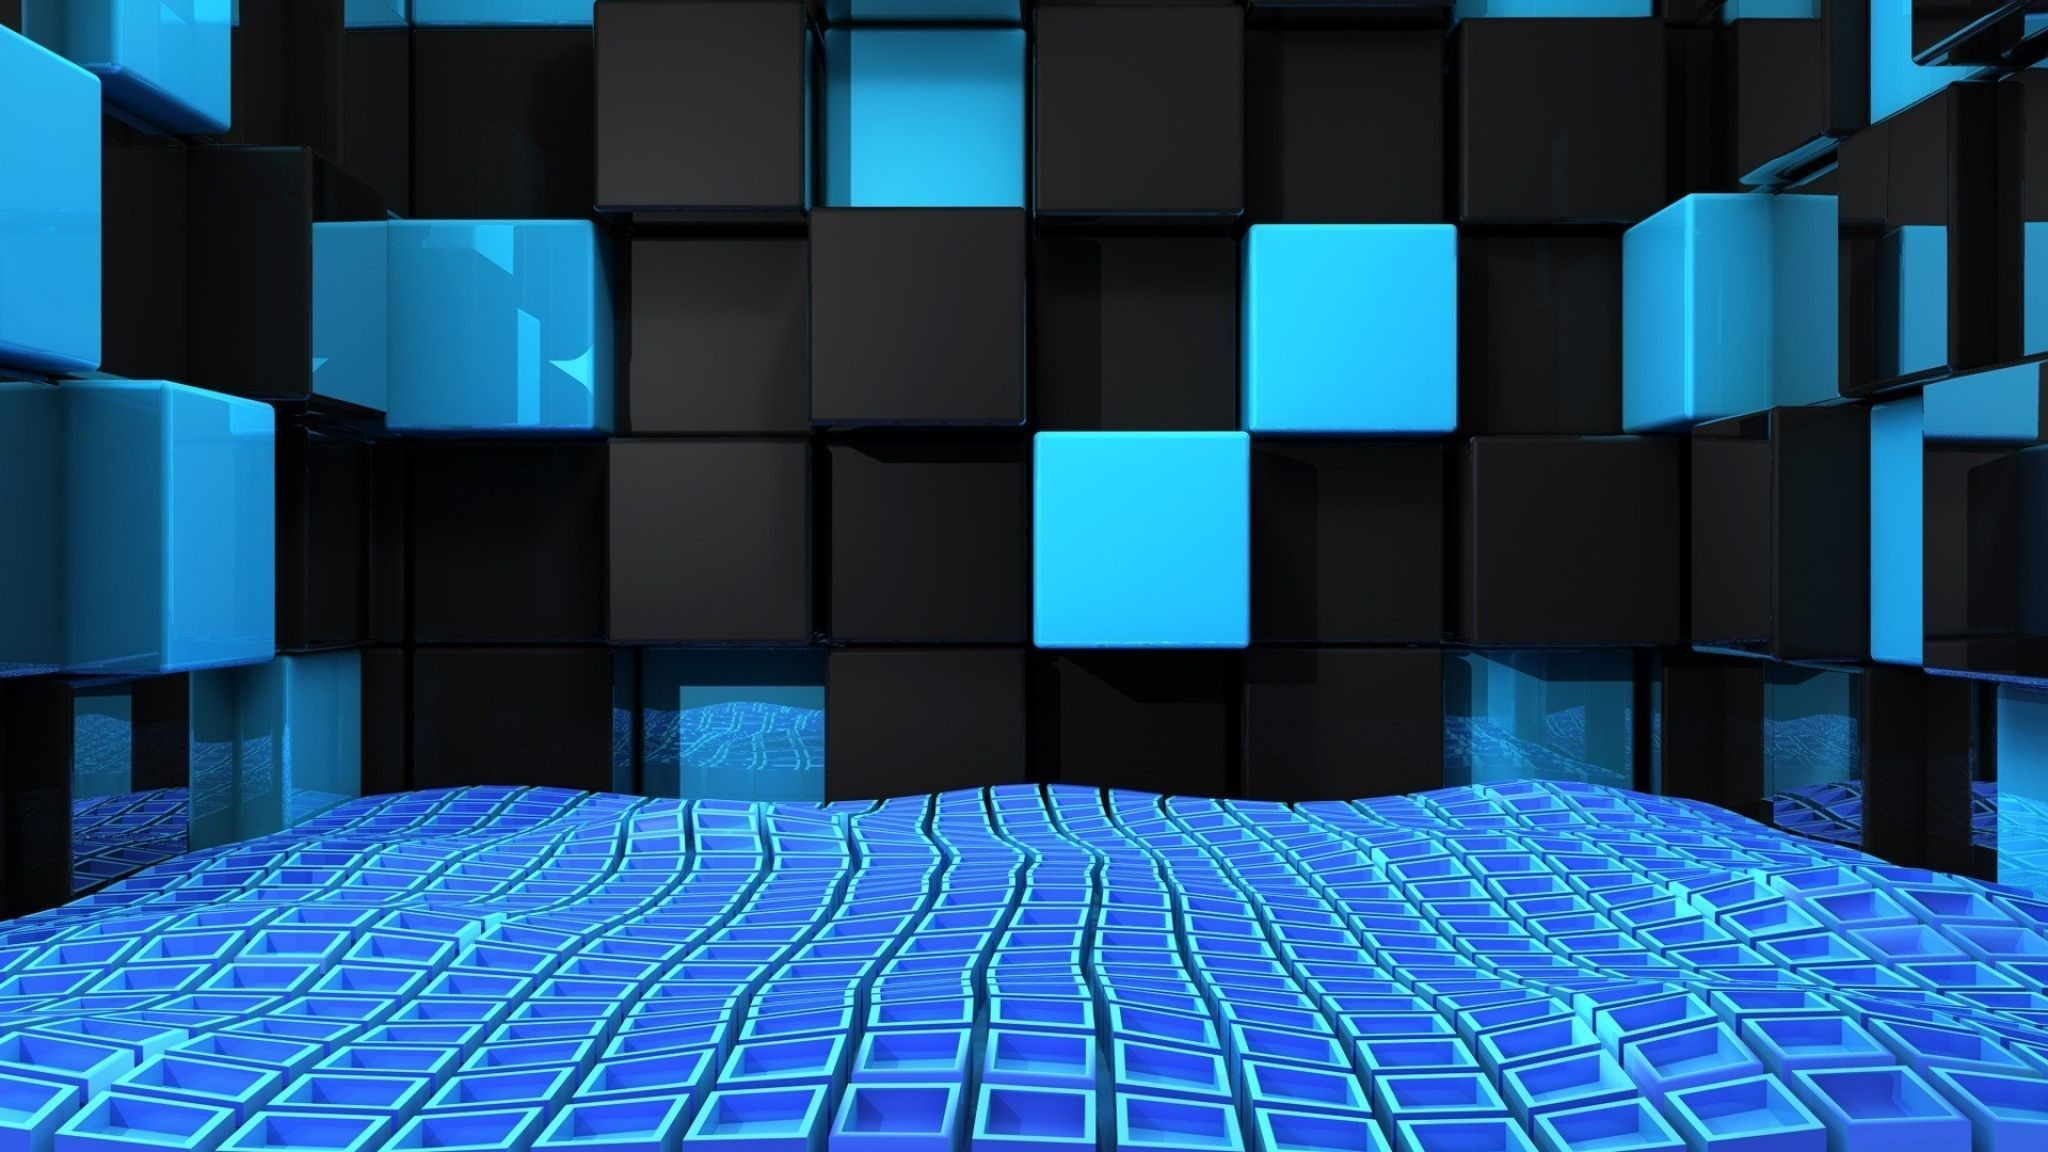 HD Cube Wallpapers HD, Desktop Backgrounds Downloads All ..